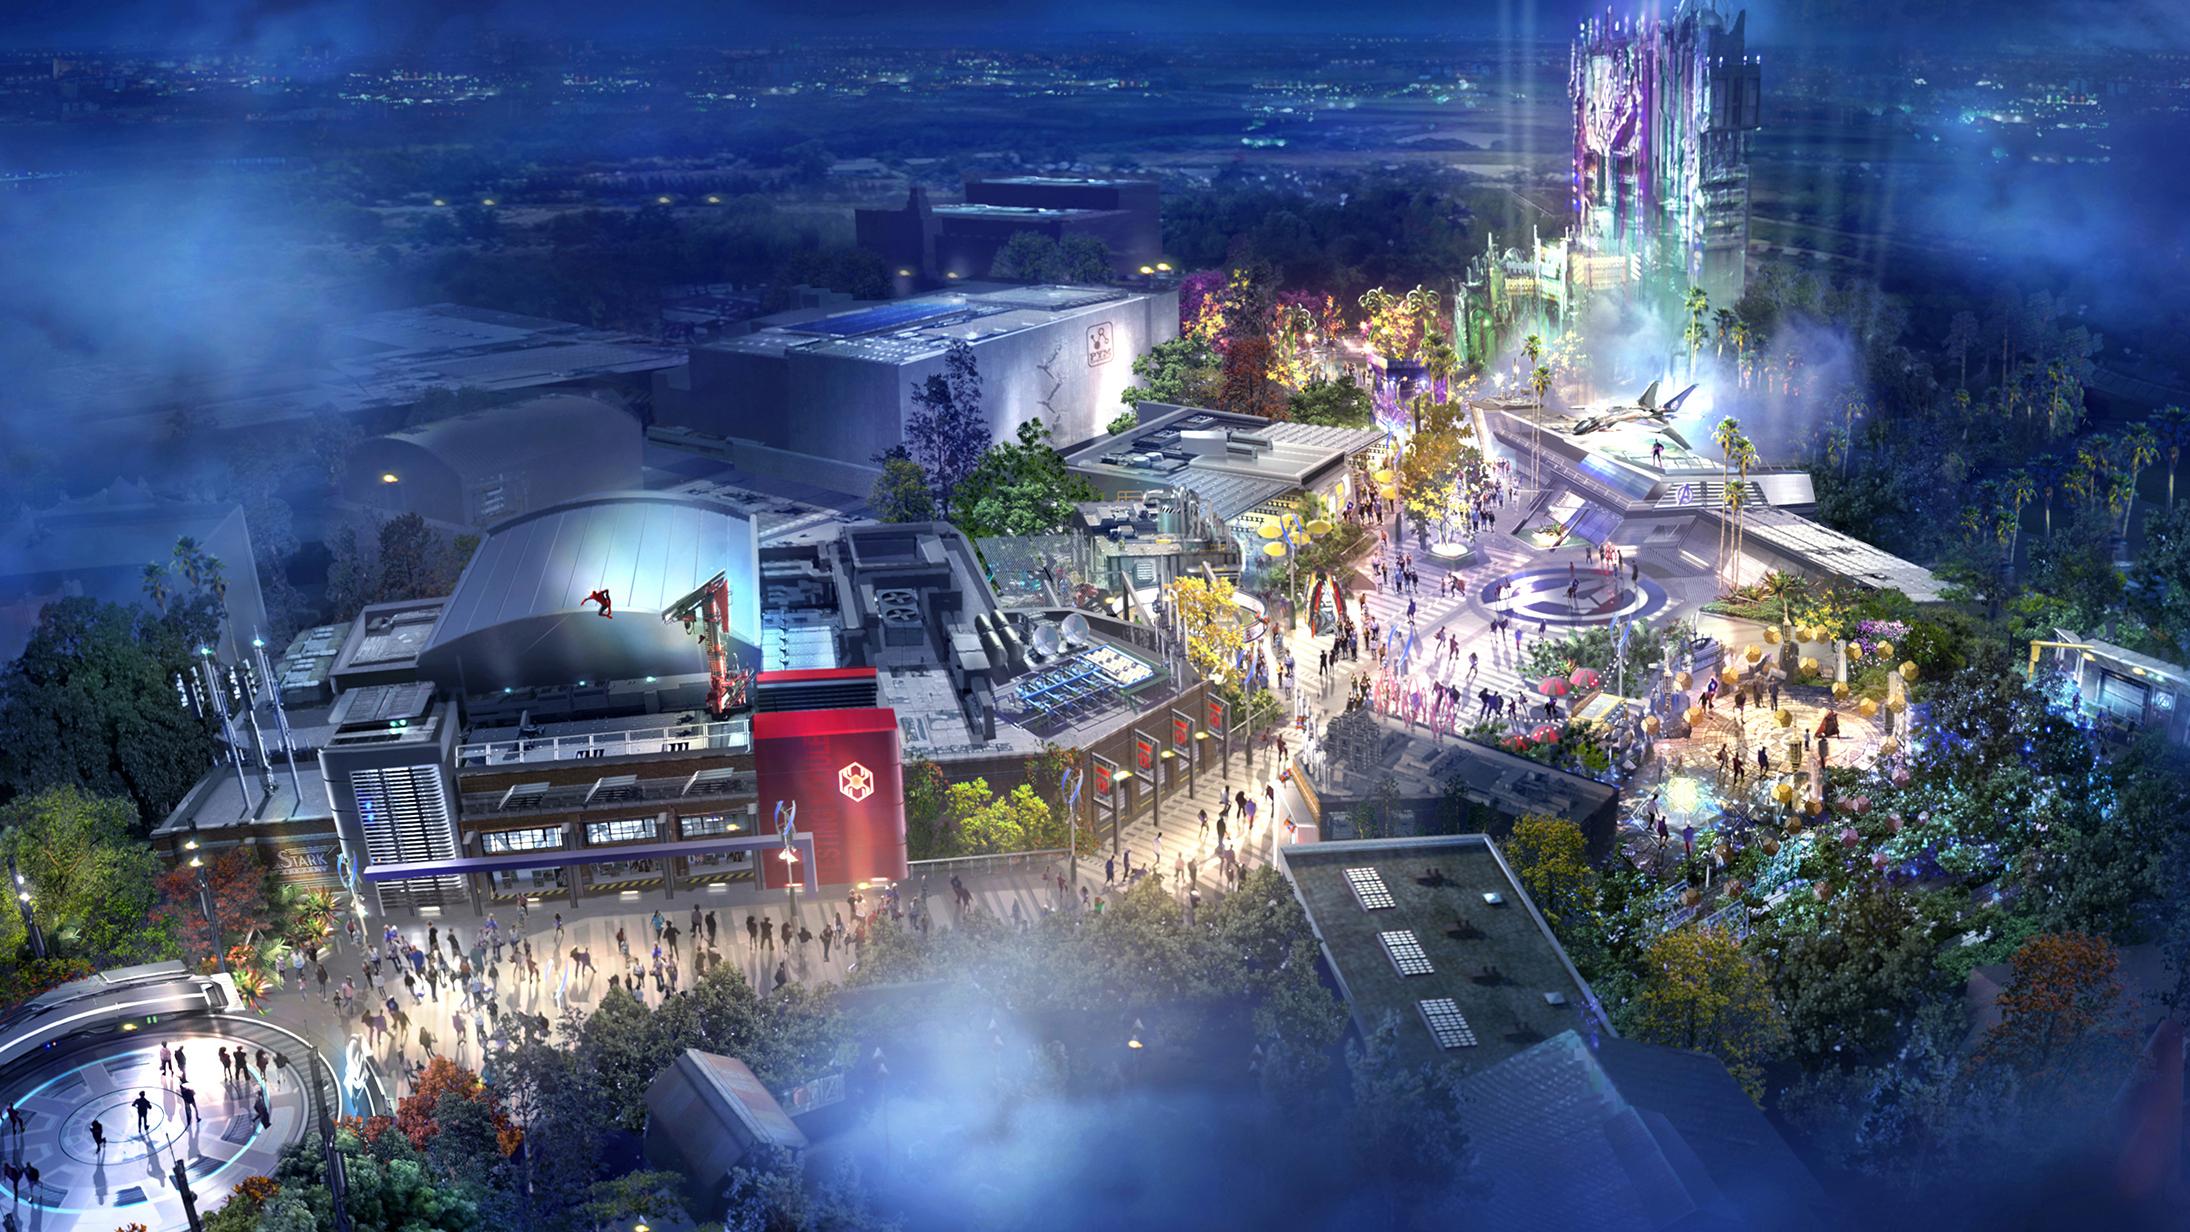 Disneyland California Adventure Park will debut Avengers Campus in 2020.